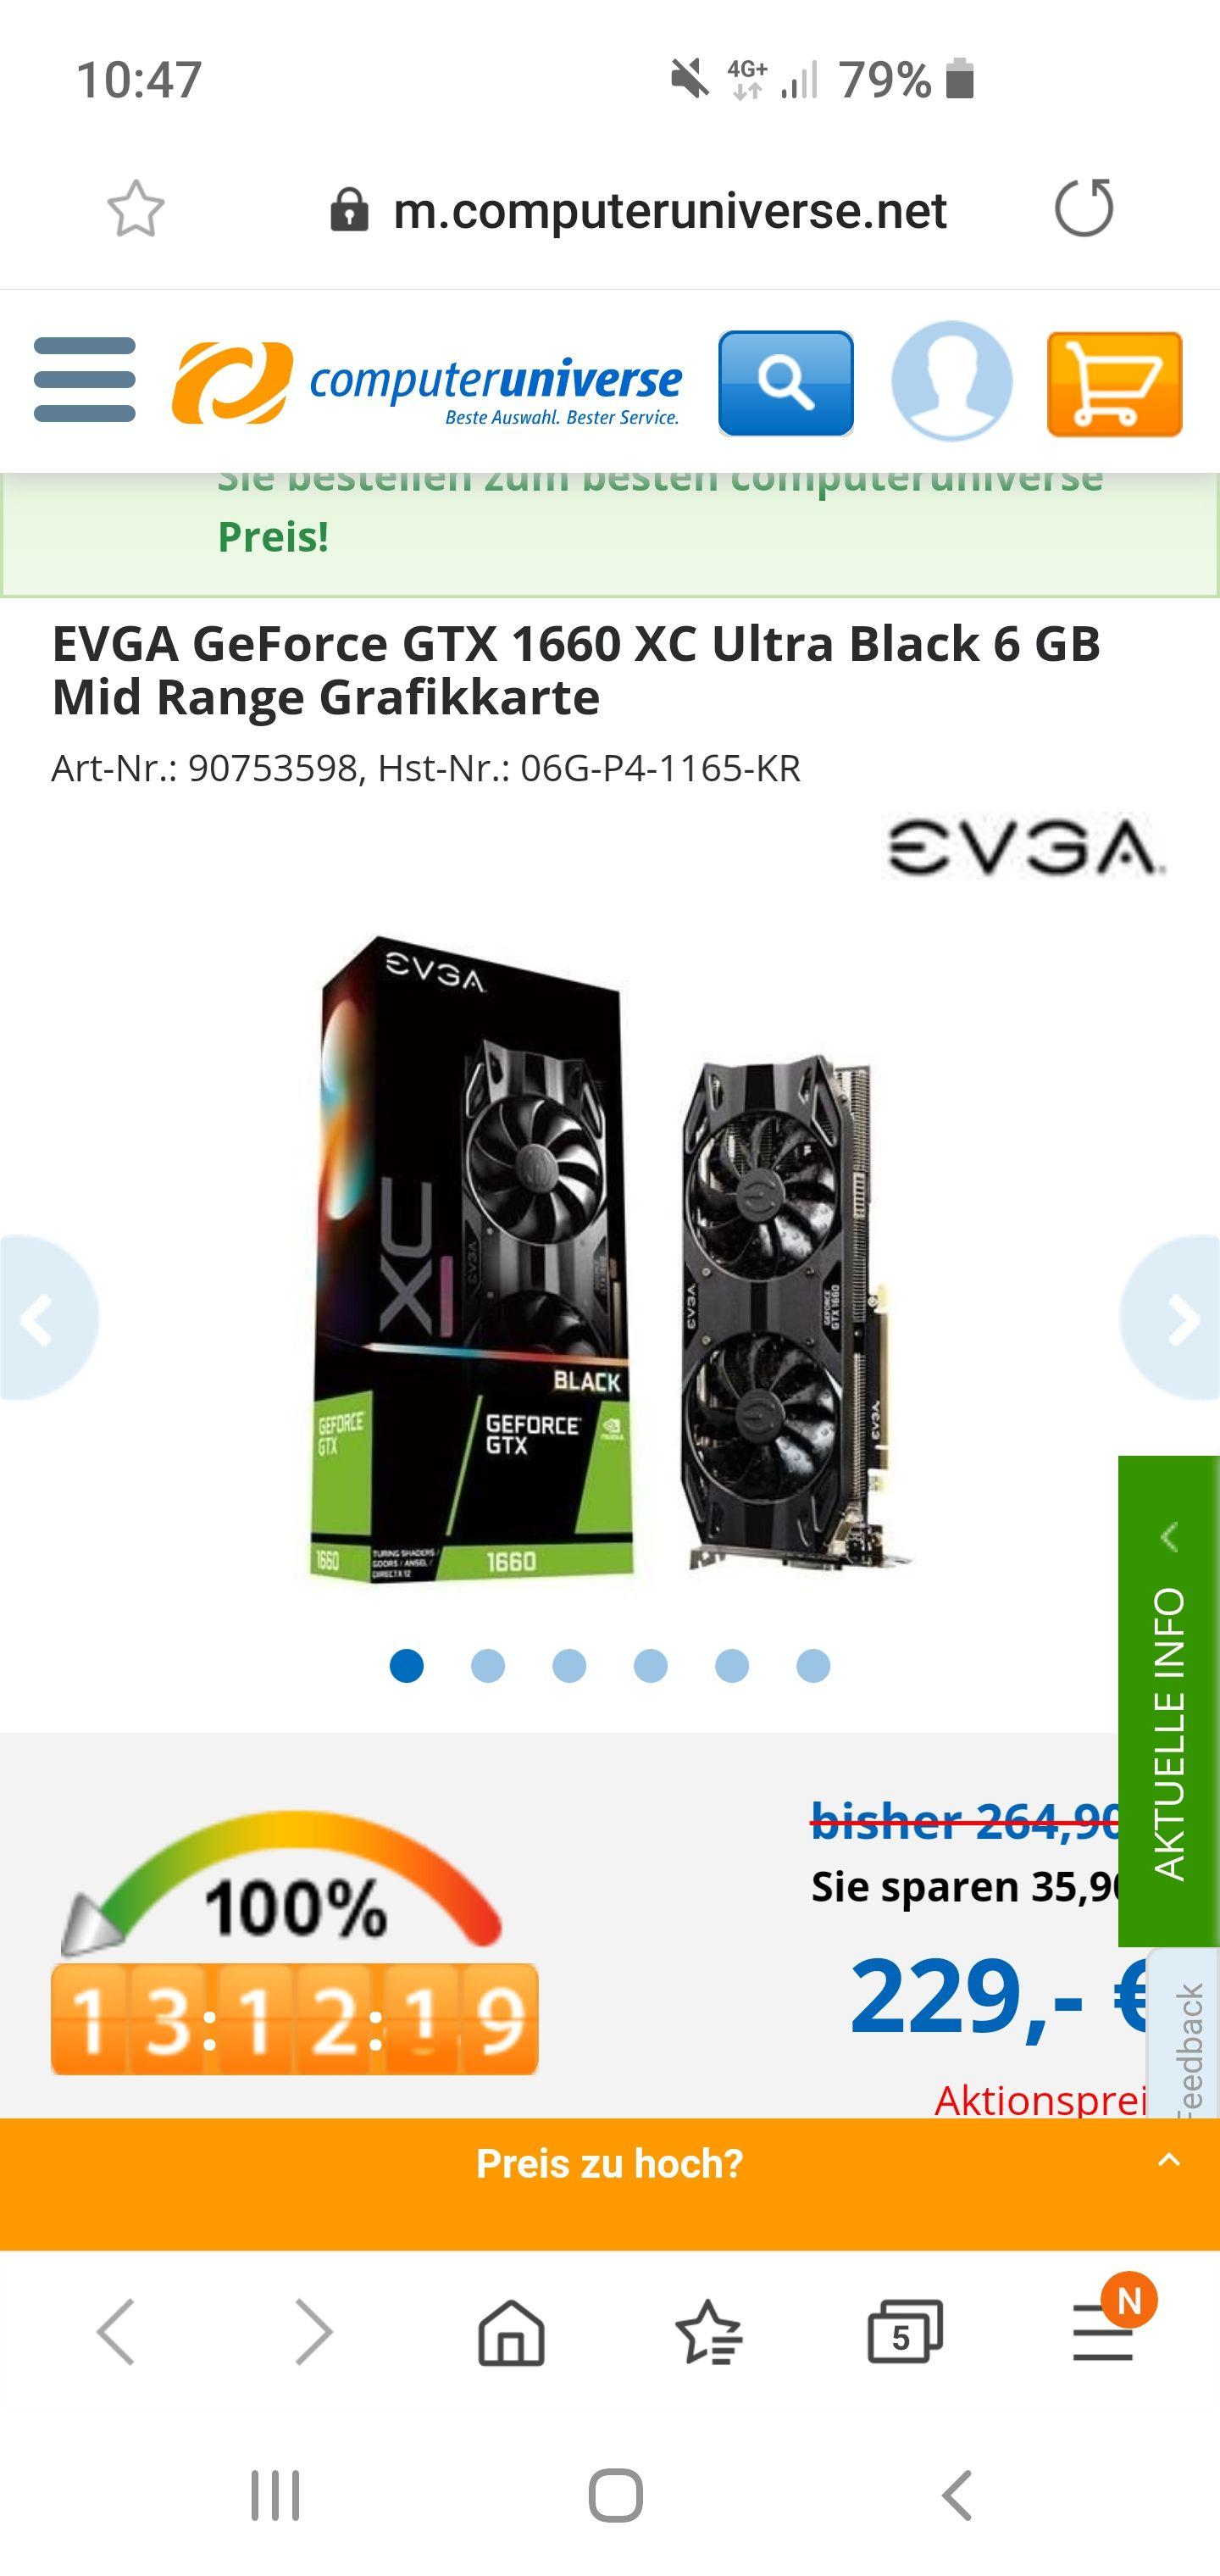 computeruniverse EVGA GTX 1660 XC Ultra Black 6GB